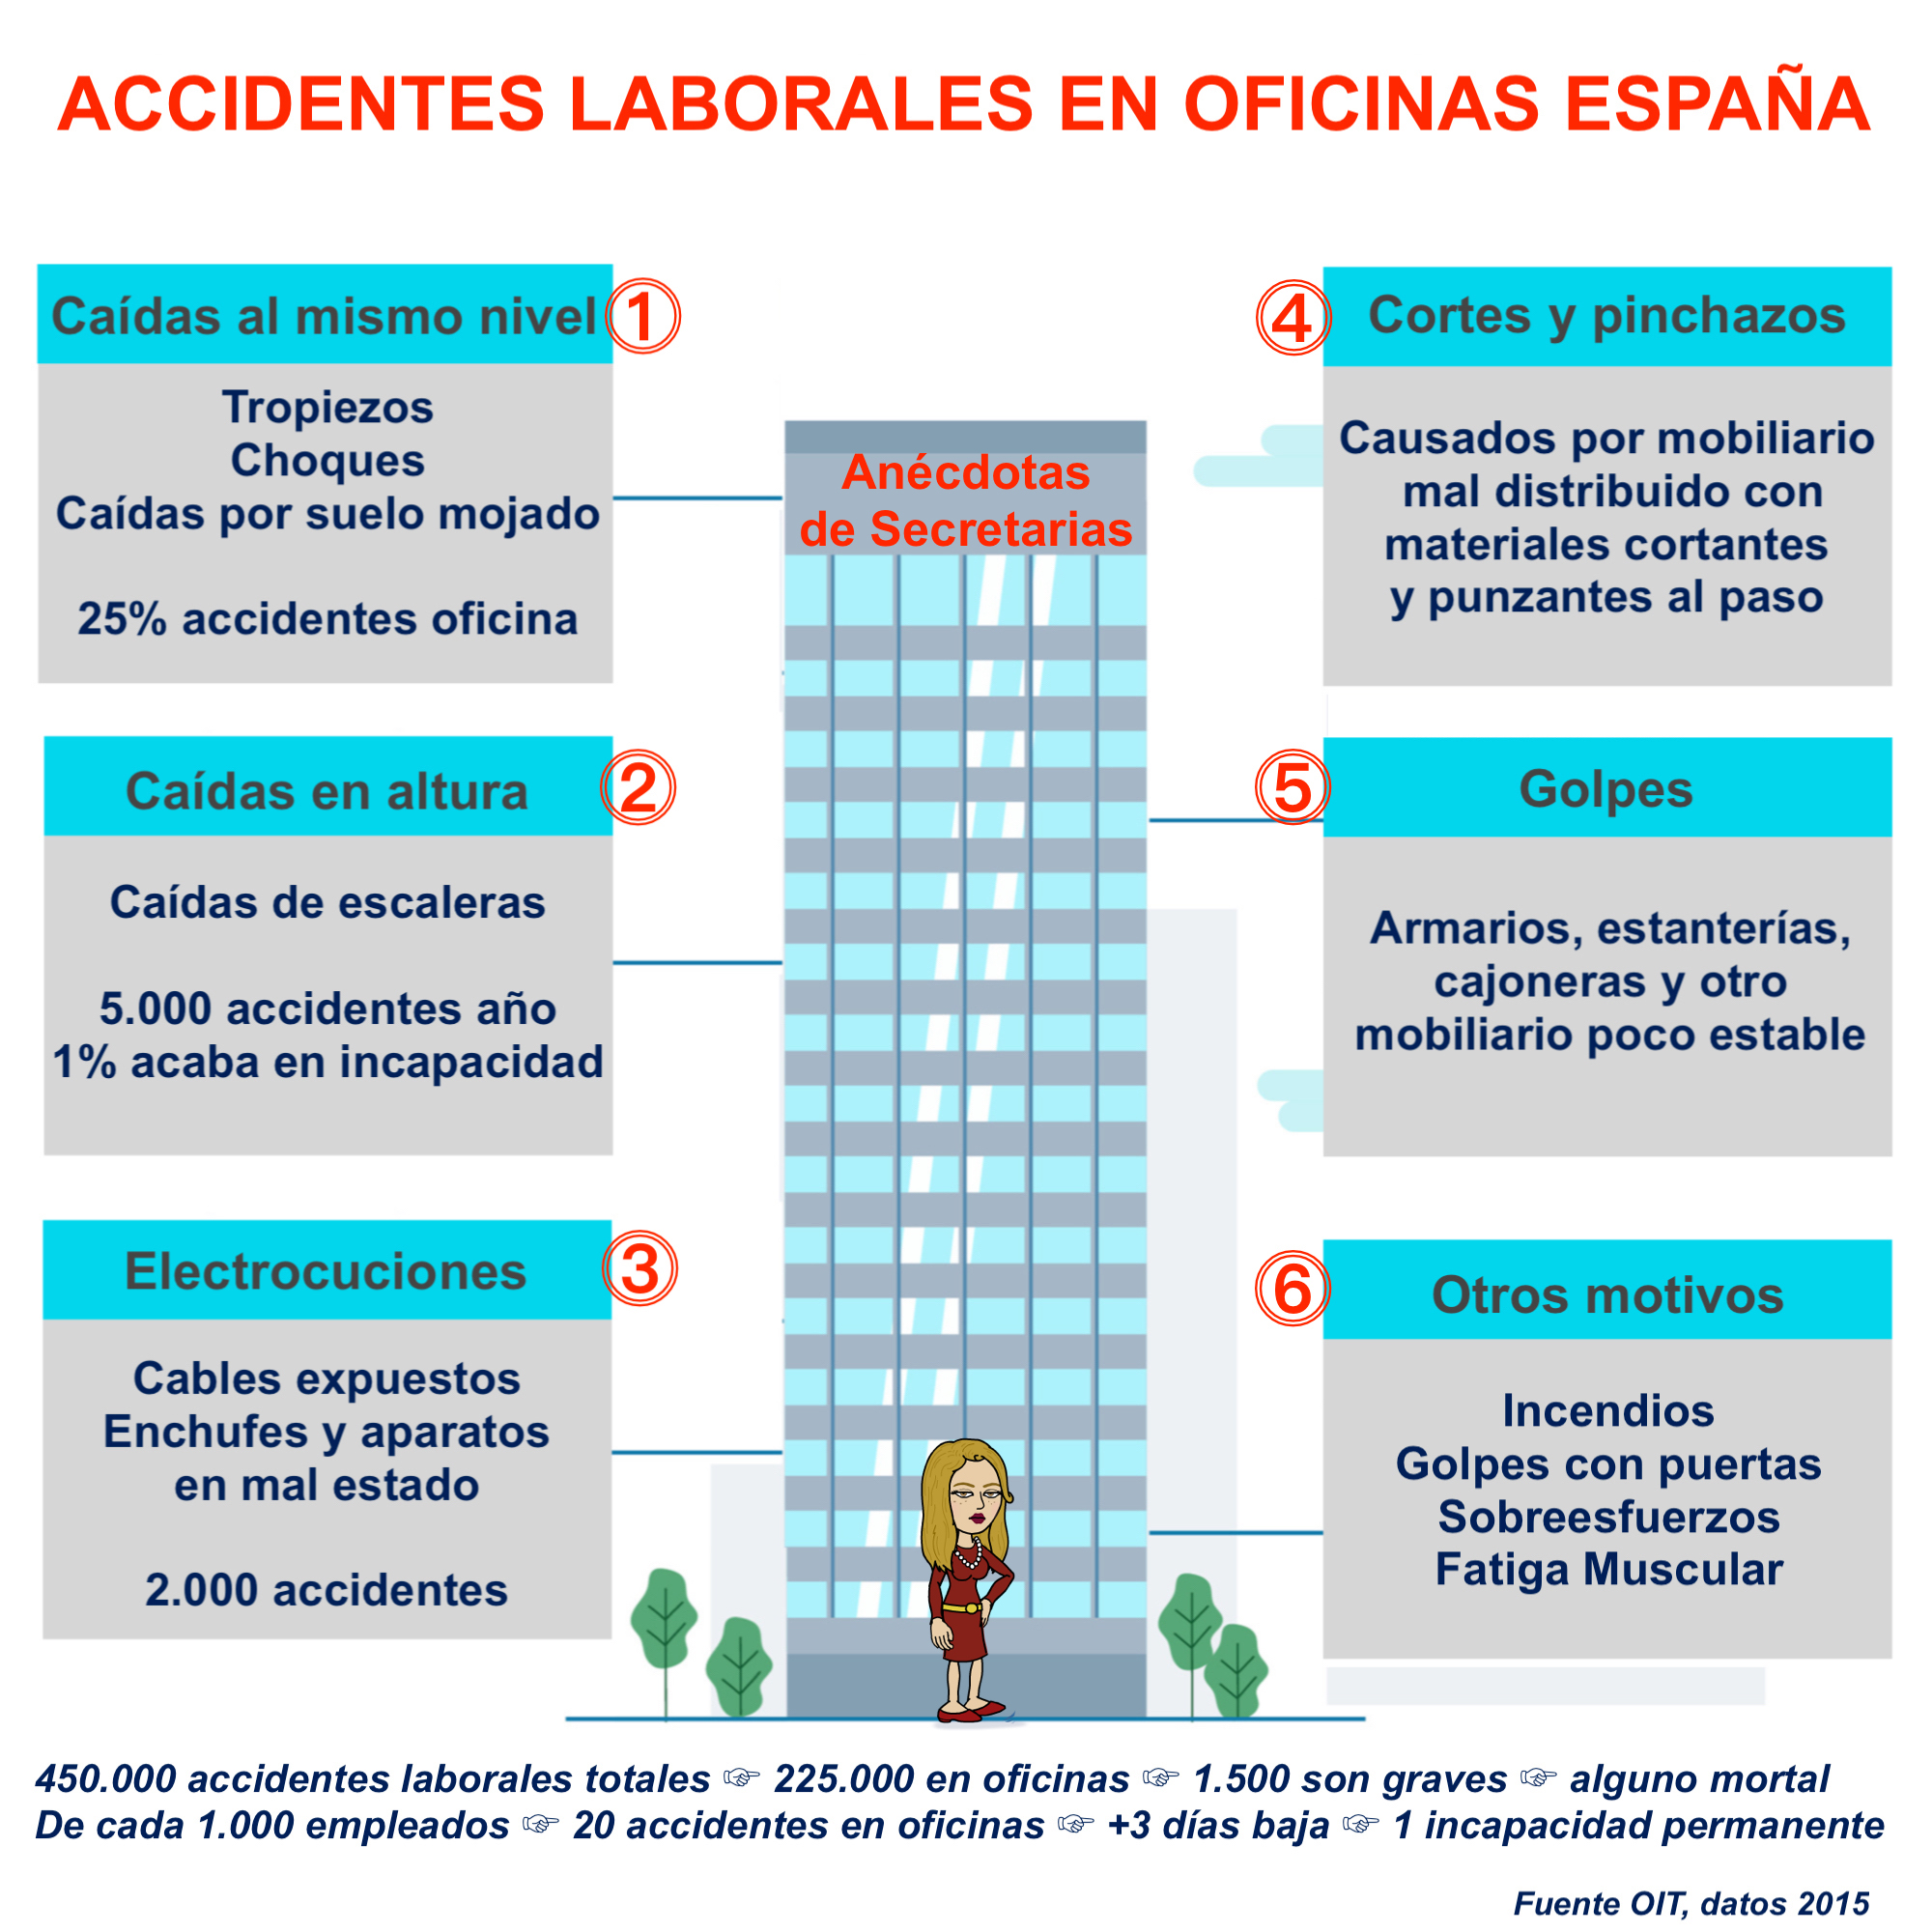 infografia accidentes laborales en oficinas España